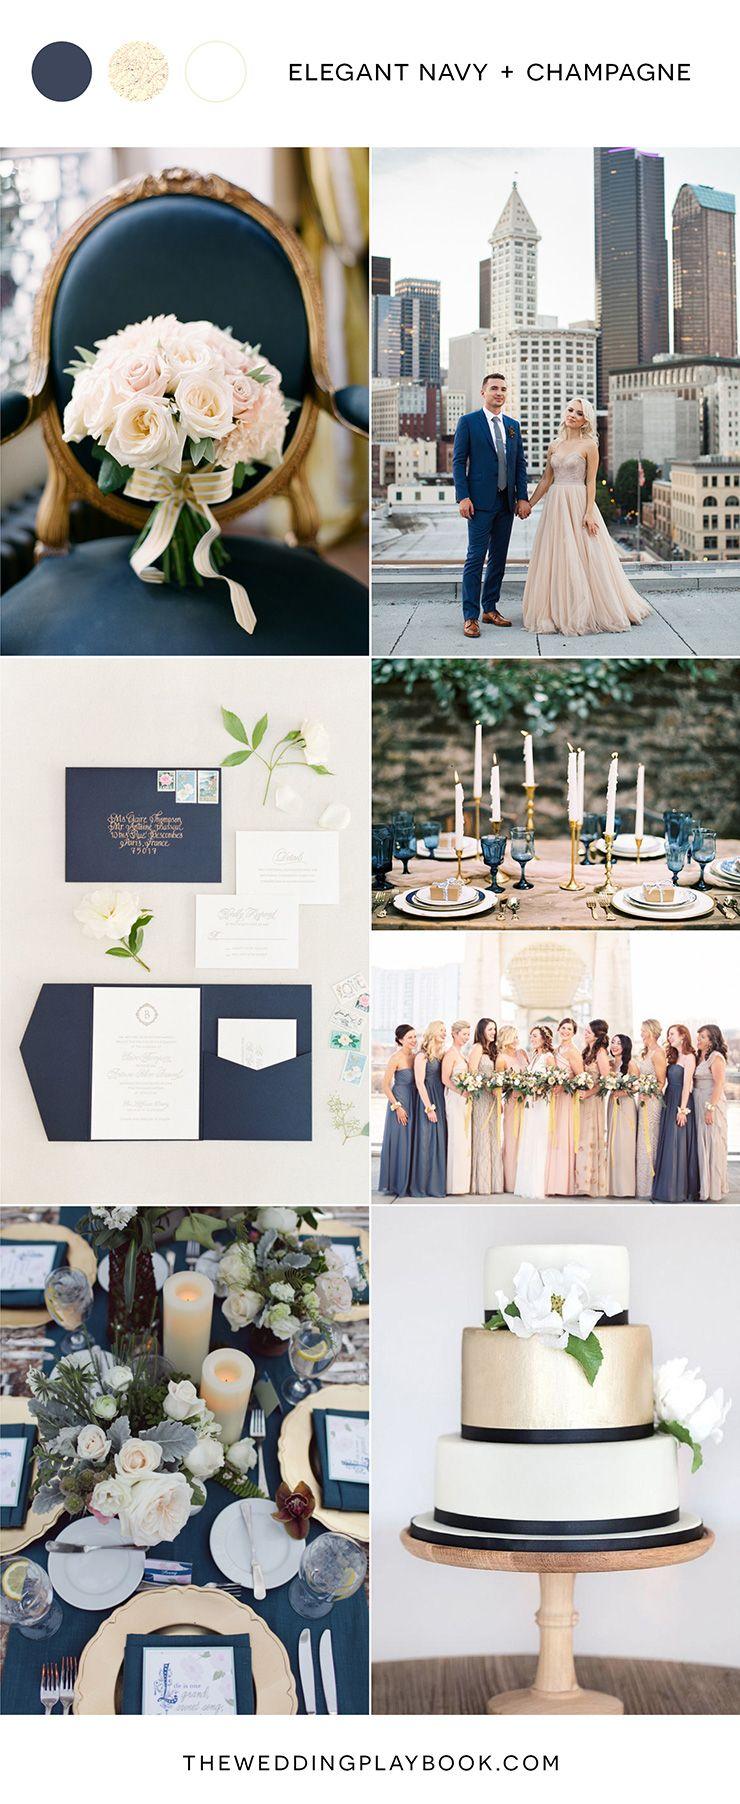 892440056f Elegant Navy and Champagne Wedding Inspiration